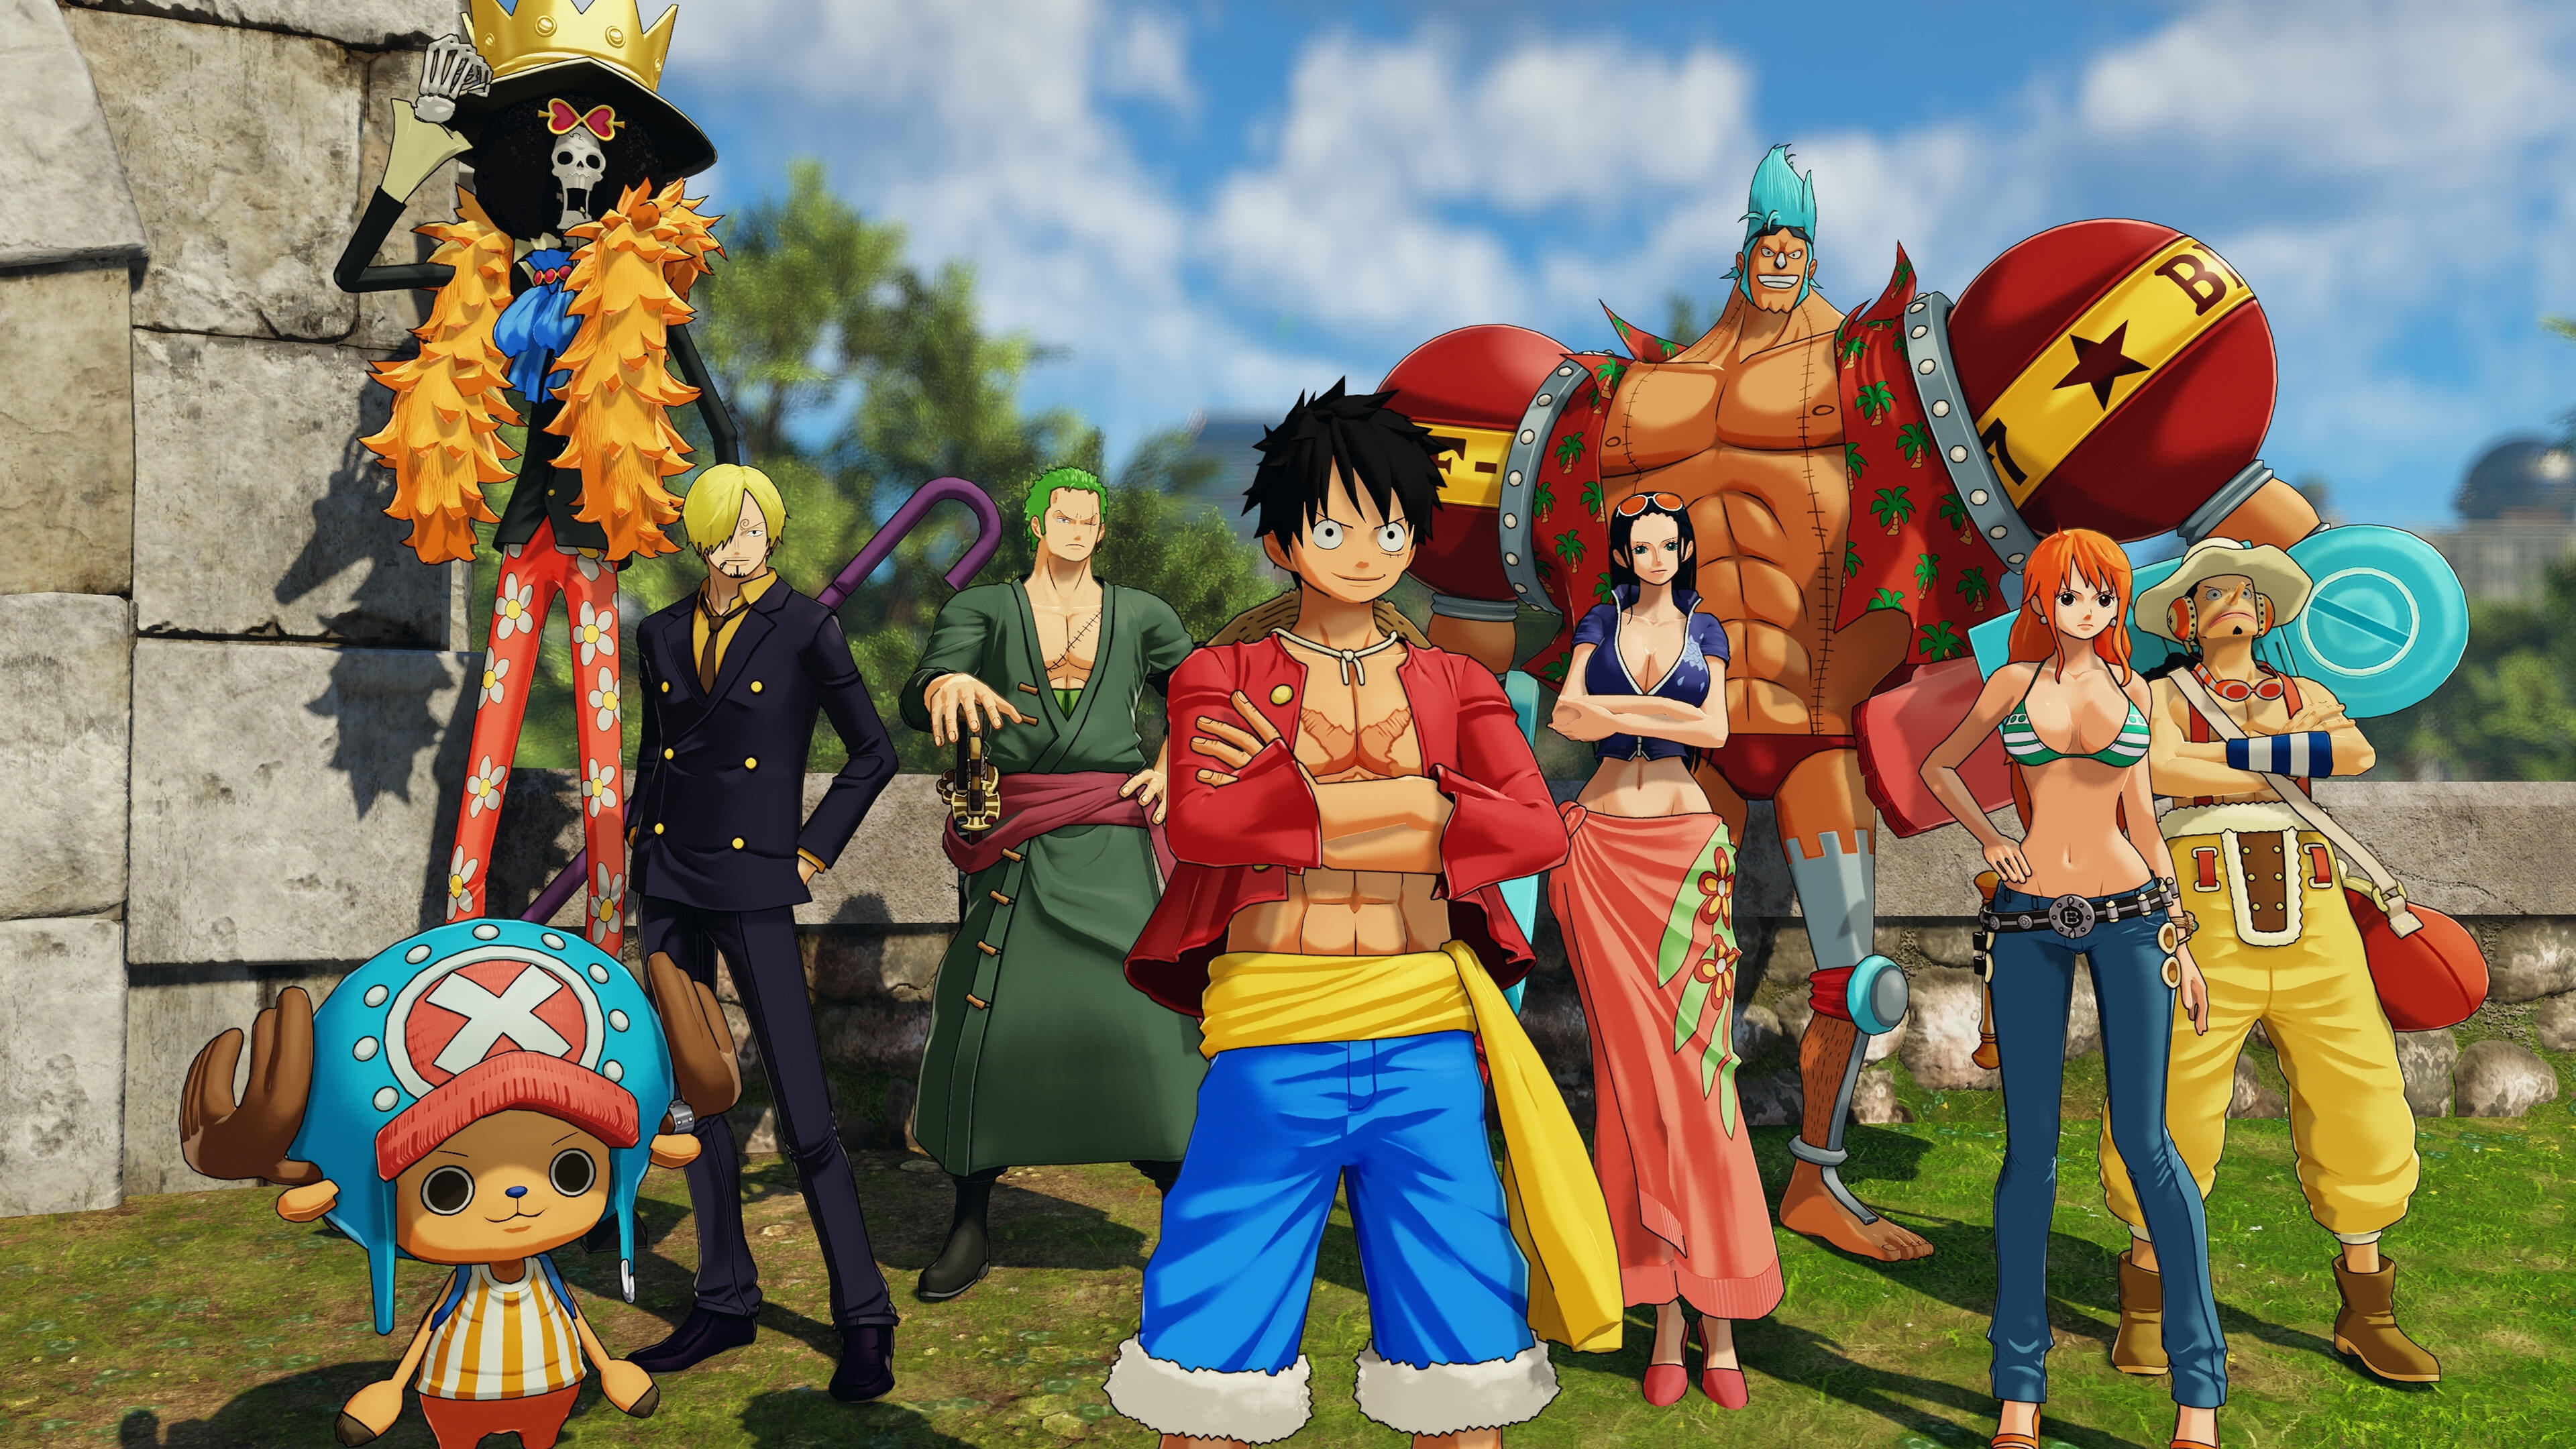 One Piece World Seeker Nami 2287628 Hd Wallpaper